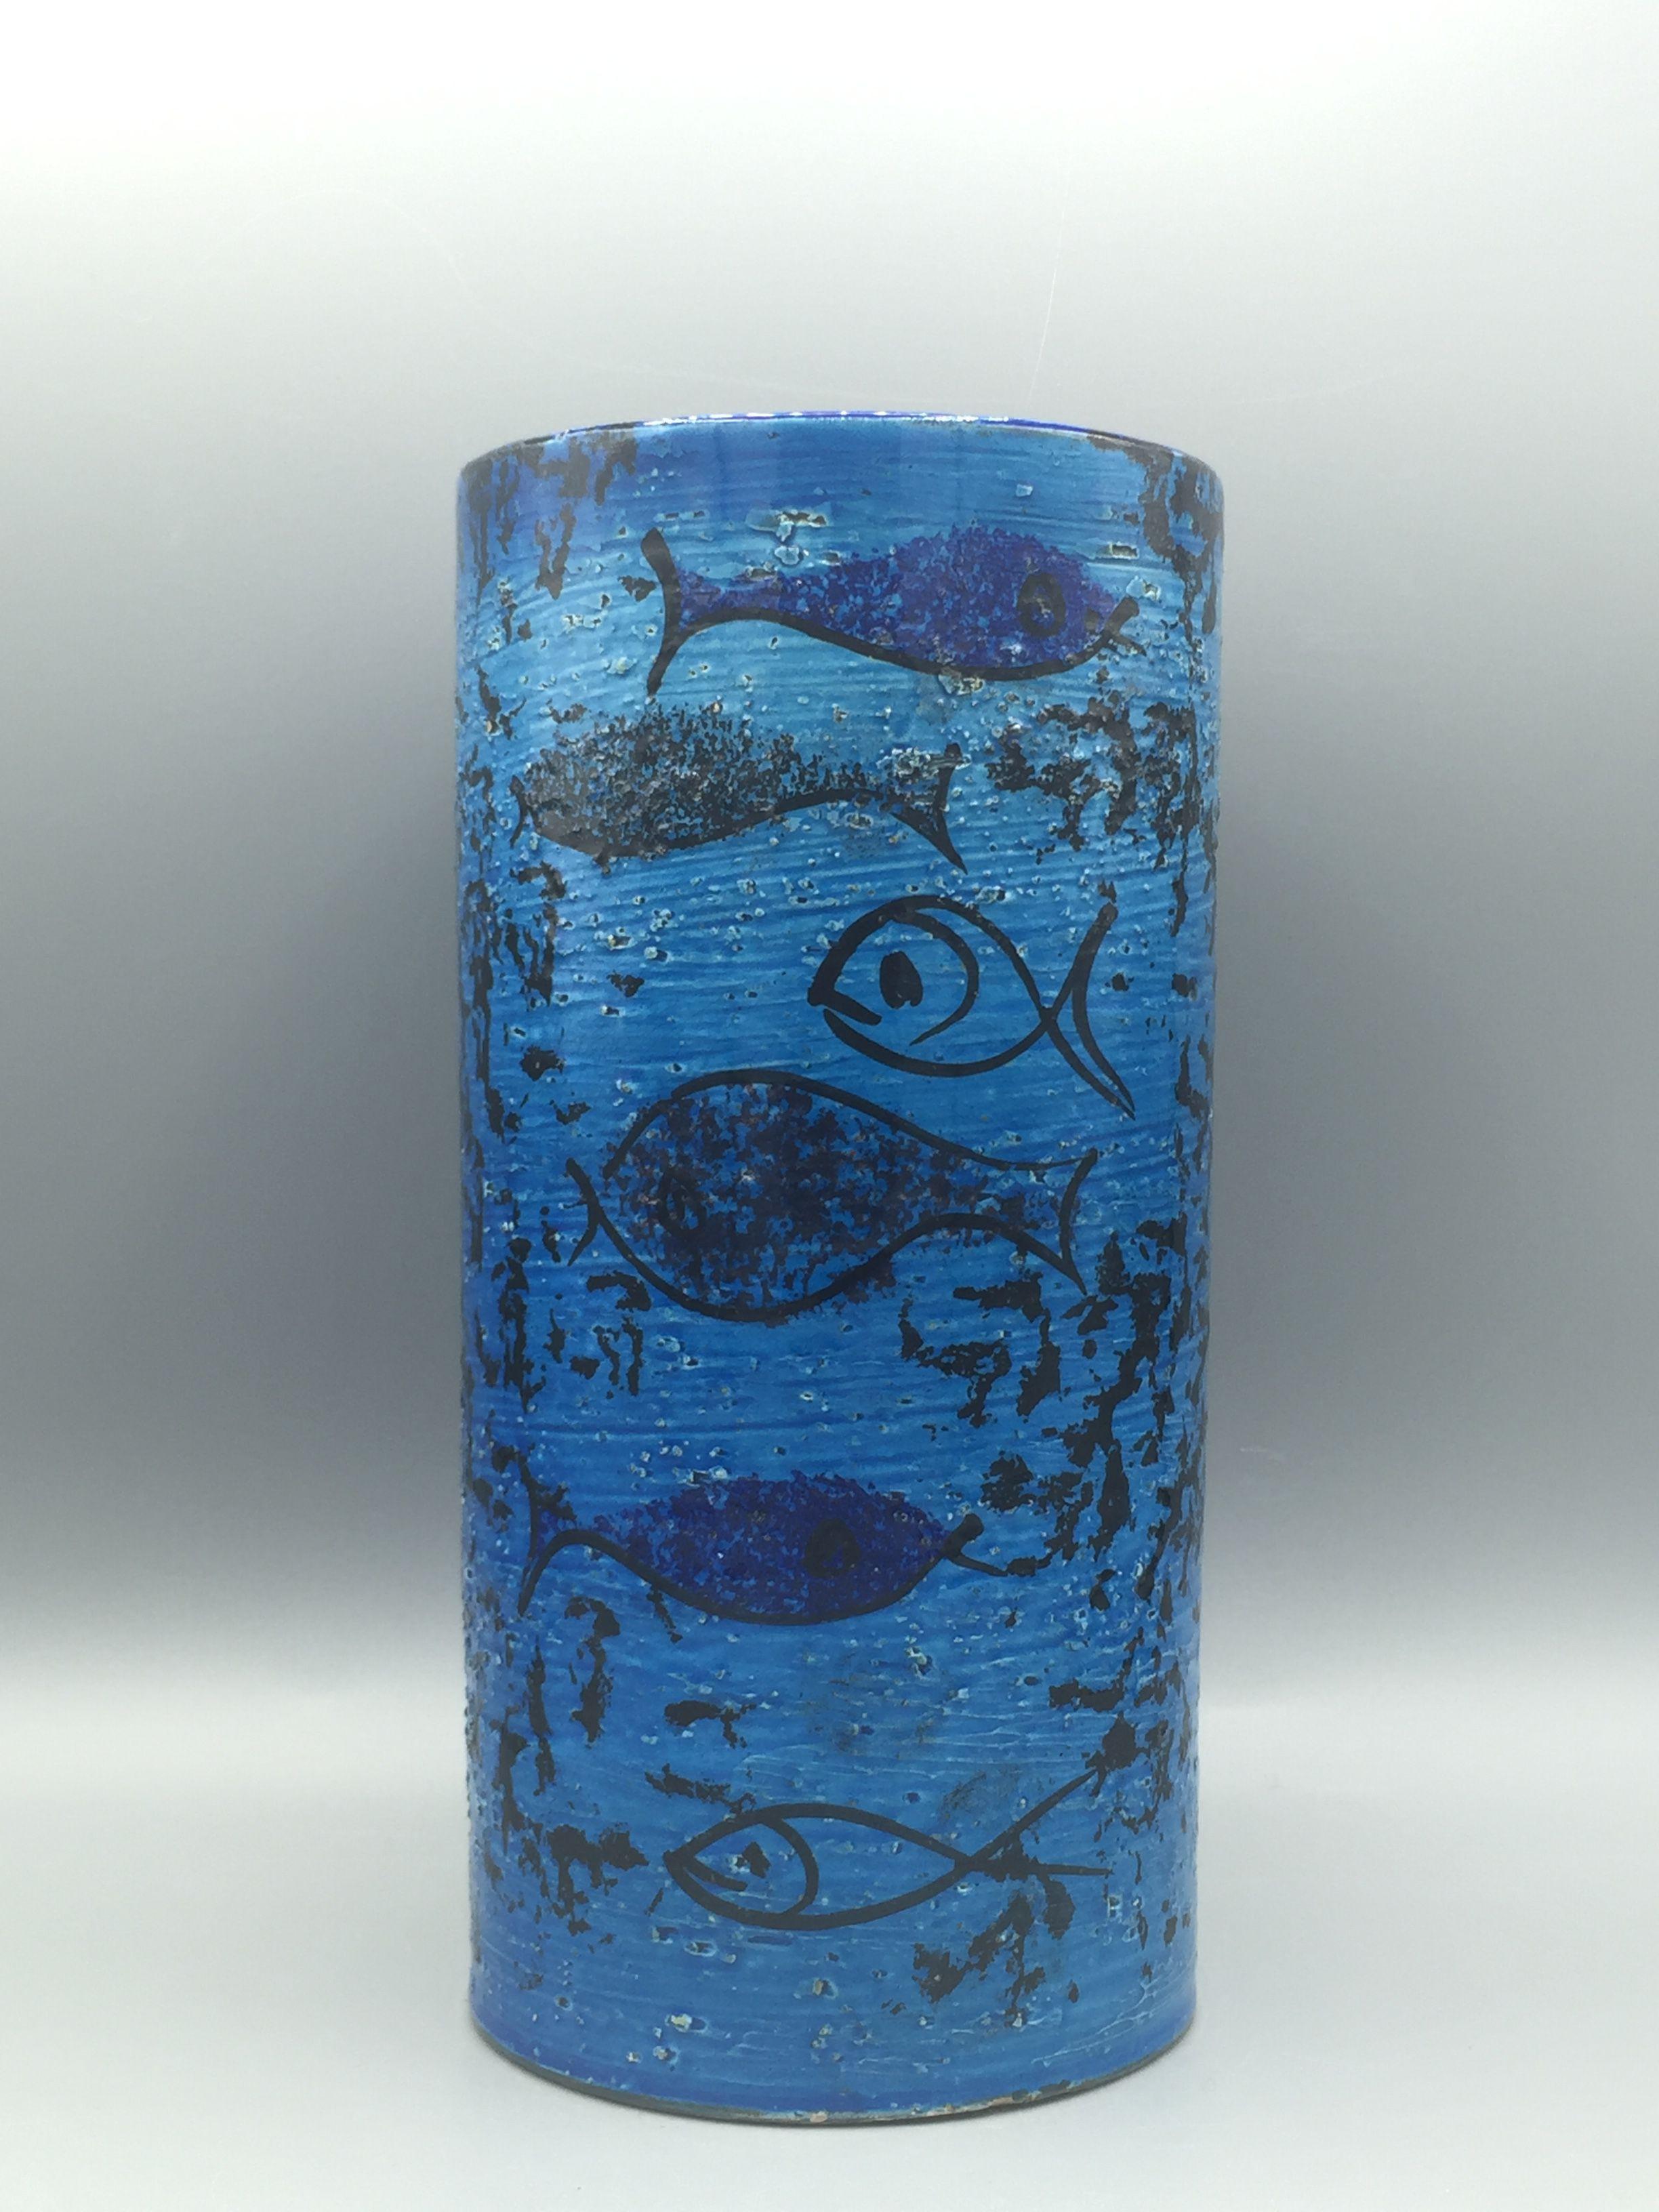 Fish In Vase Of Bitossi Rimini Blue Fish Vase Bitossi Italian Pottery In Pertaining to Bitossi Rimini Blue Fish Vase